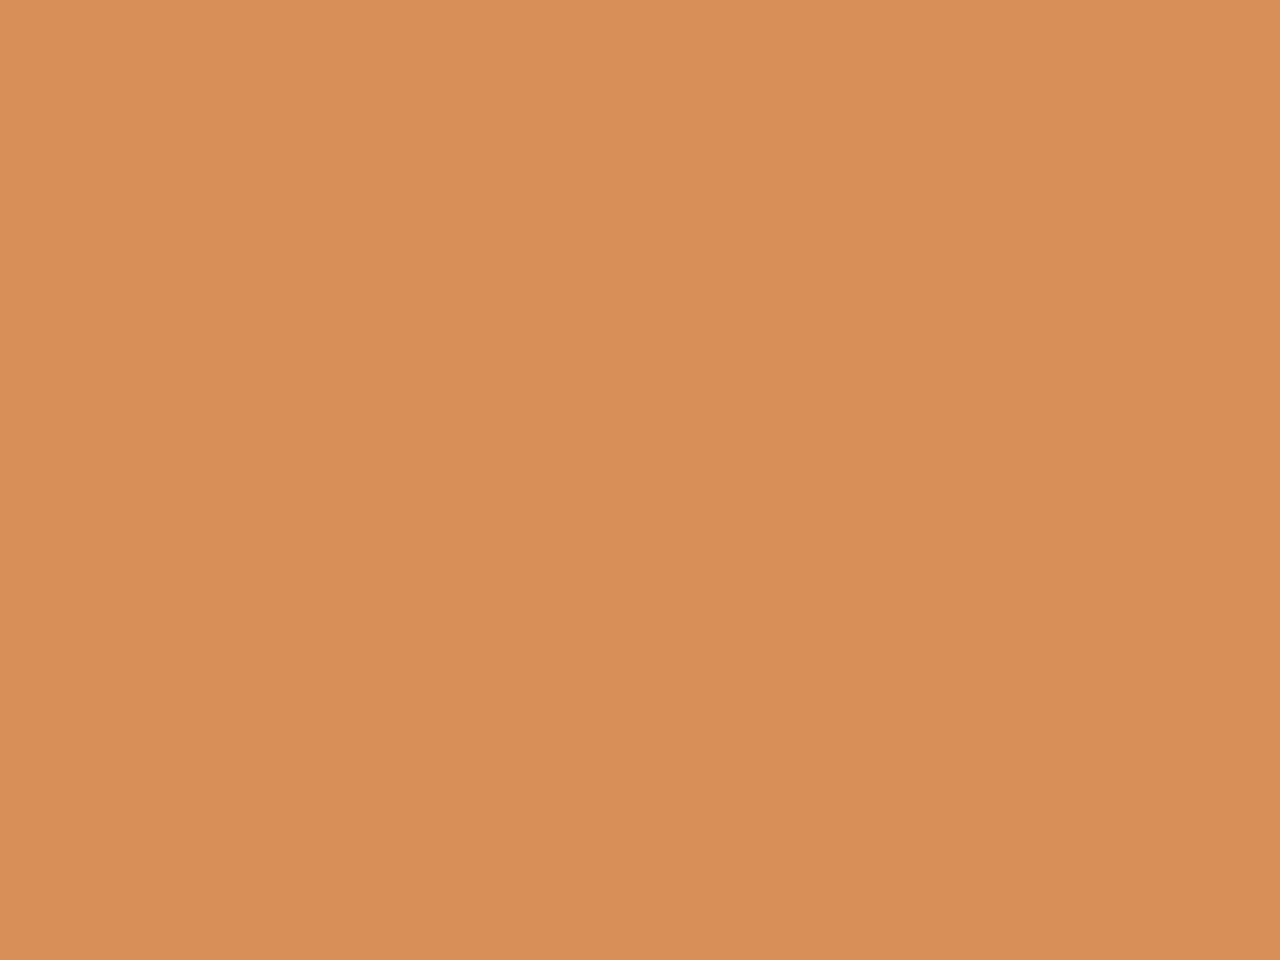 1280x960 Persian Orange Solid Color Background